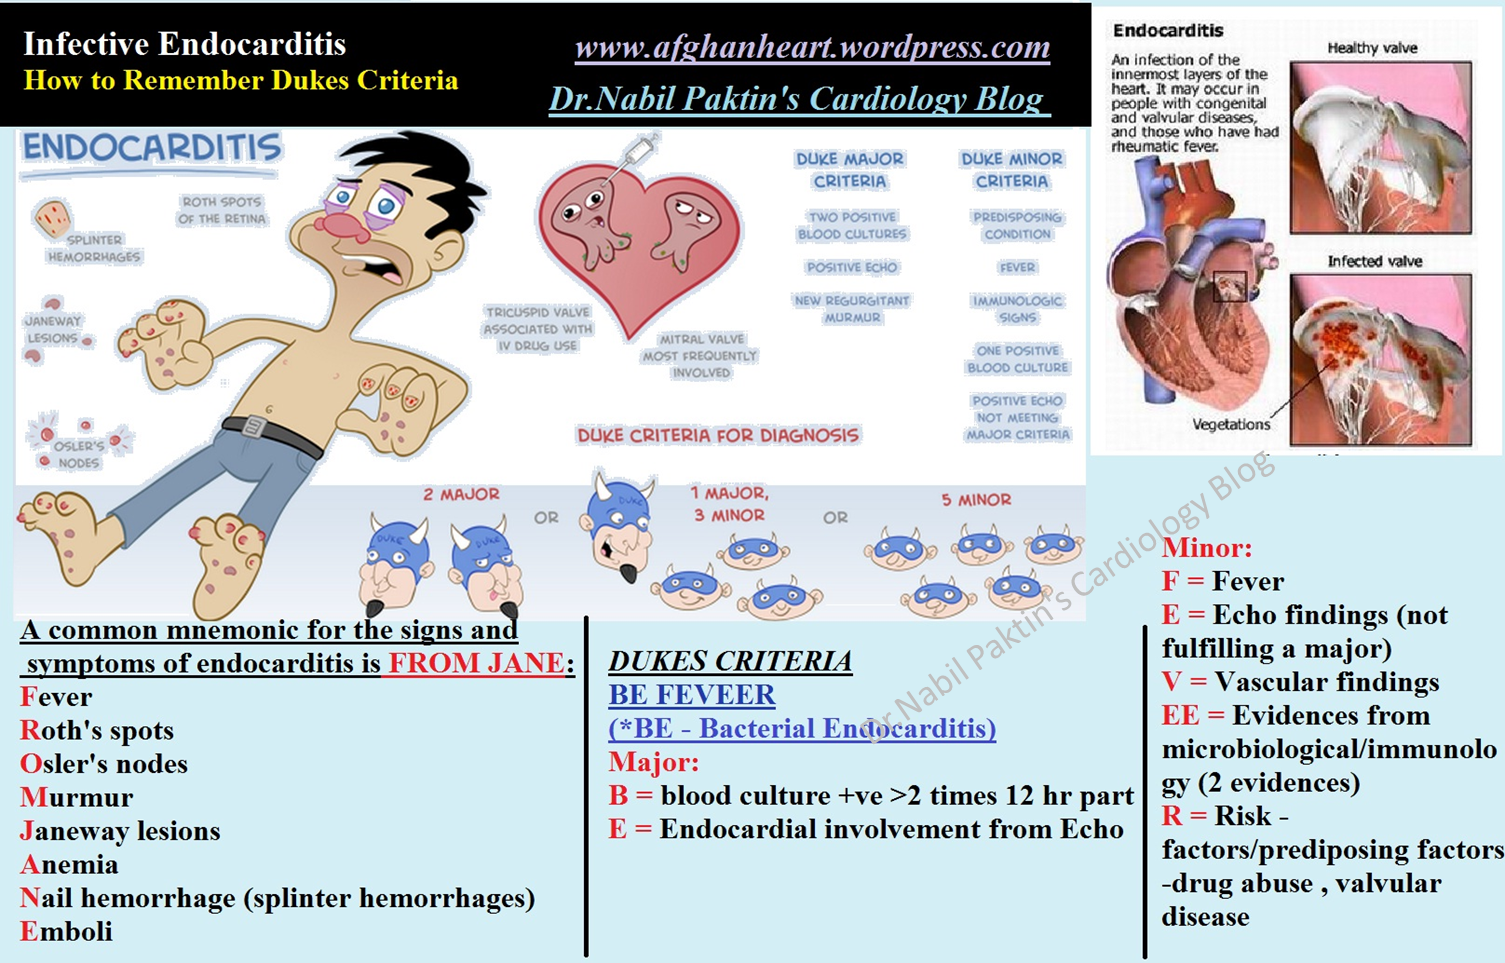 Dr.Nabil Paktin's Cardiology Blog مجله کاردیولوژی دکتور ...  Dr.Nabil Paktin...